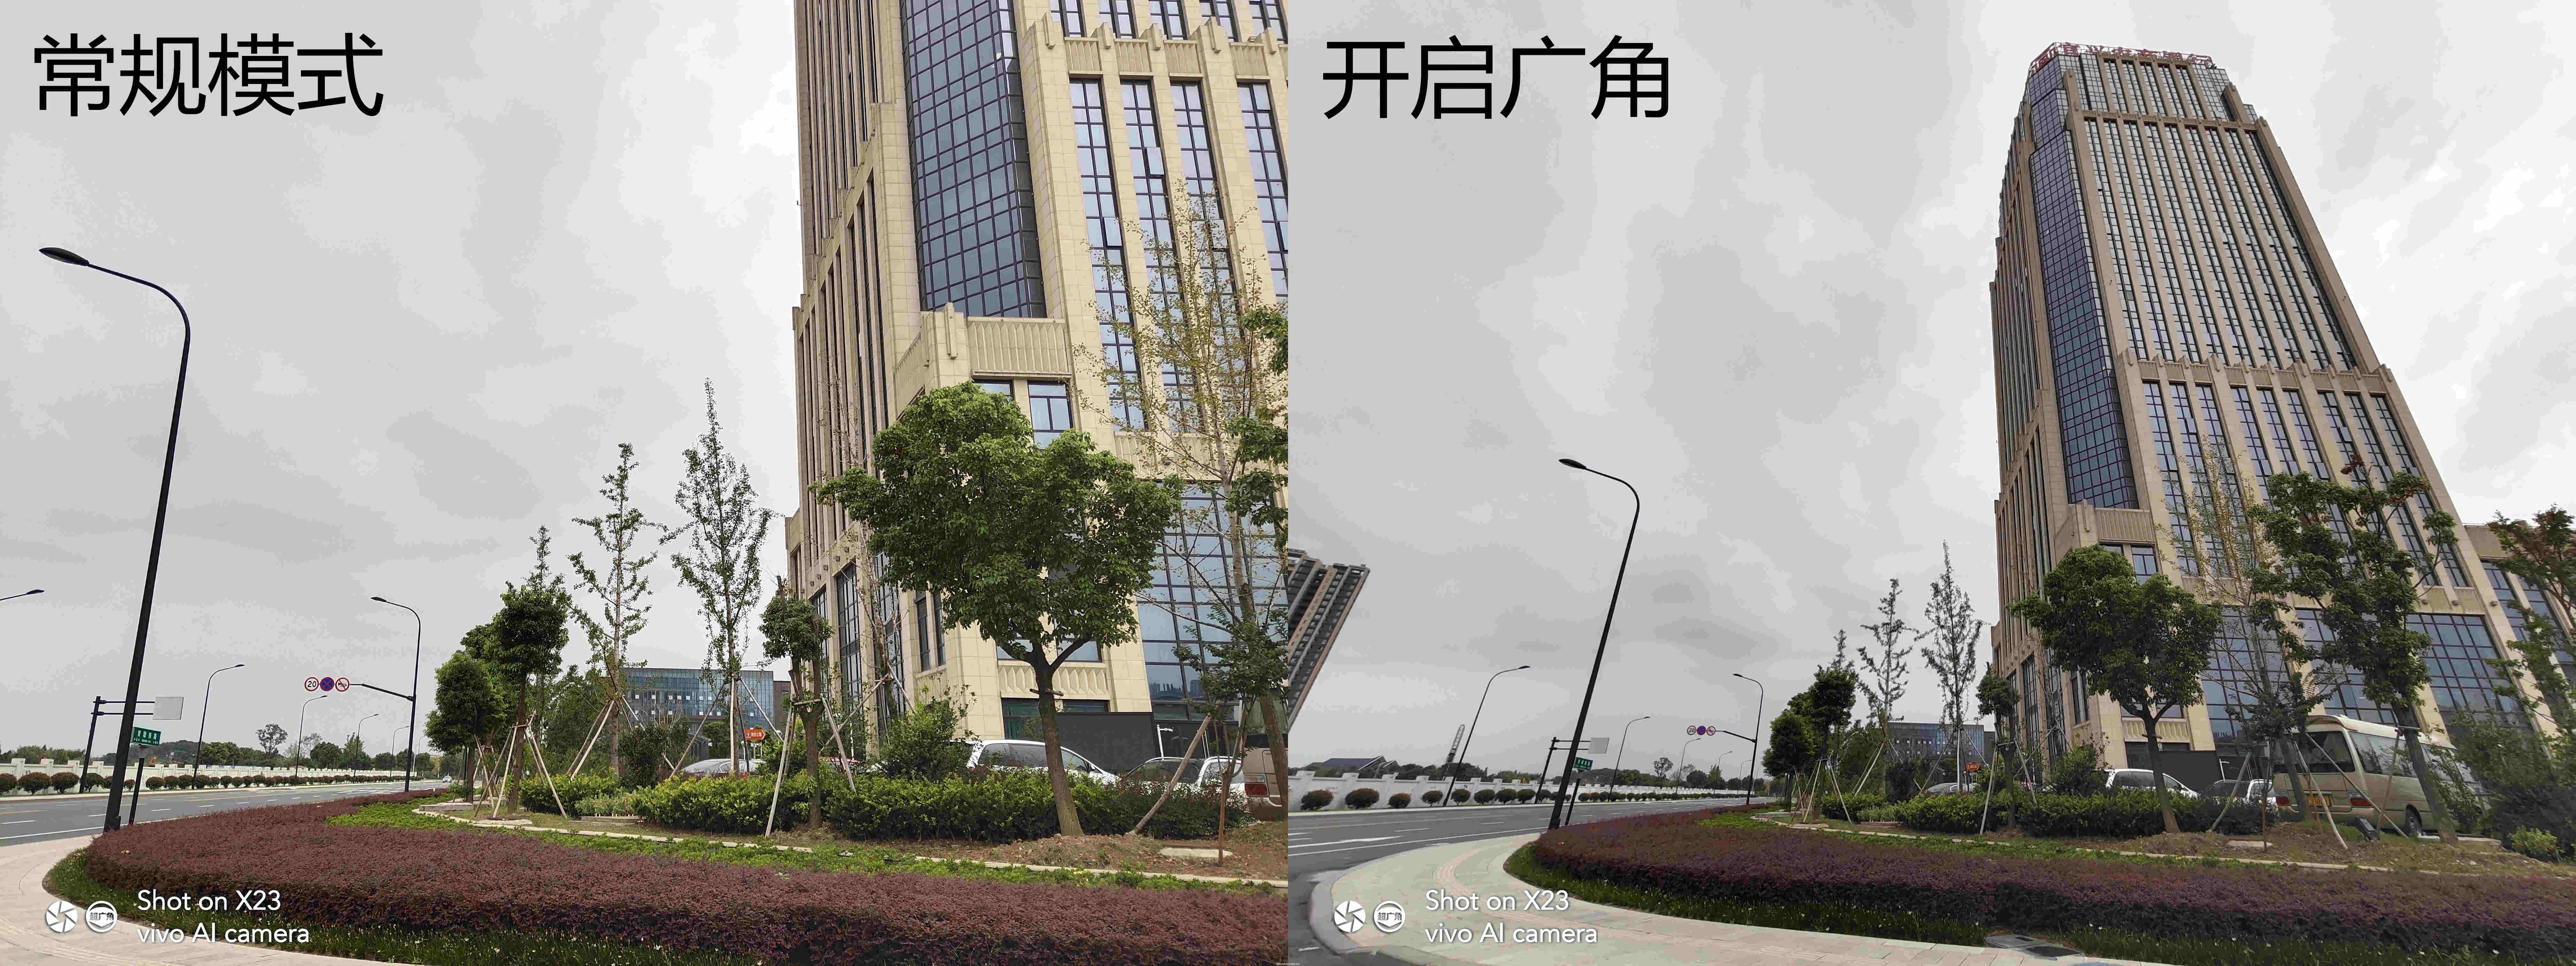 QQ图片20180916175130_副本.jpg